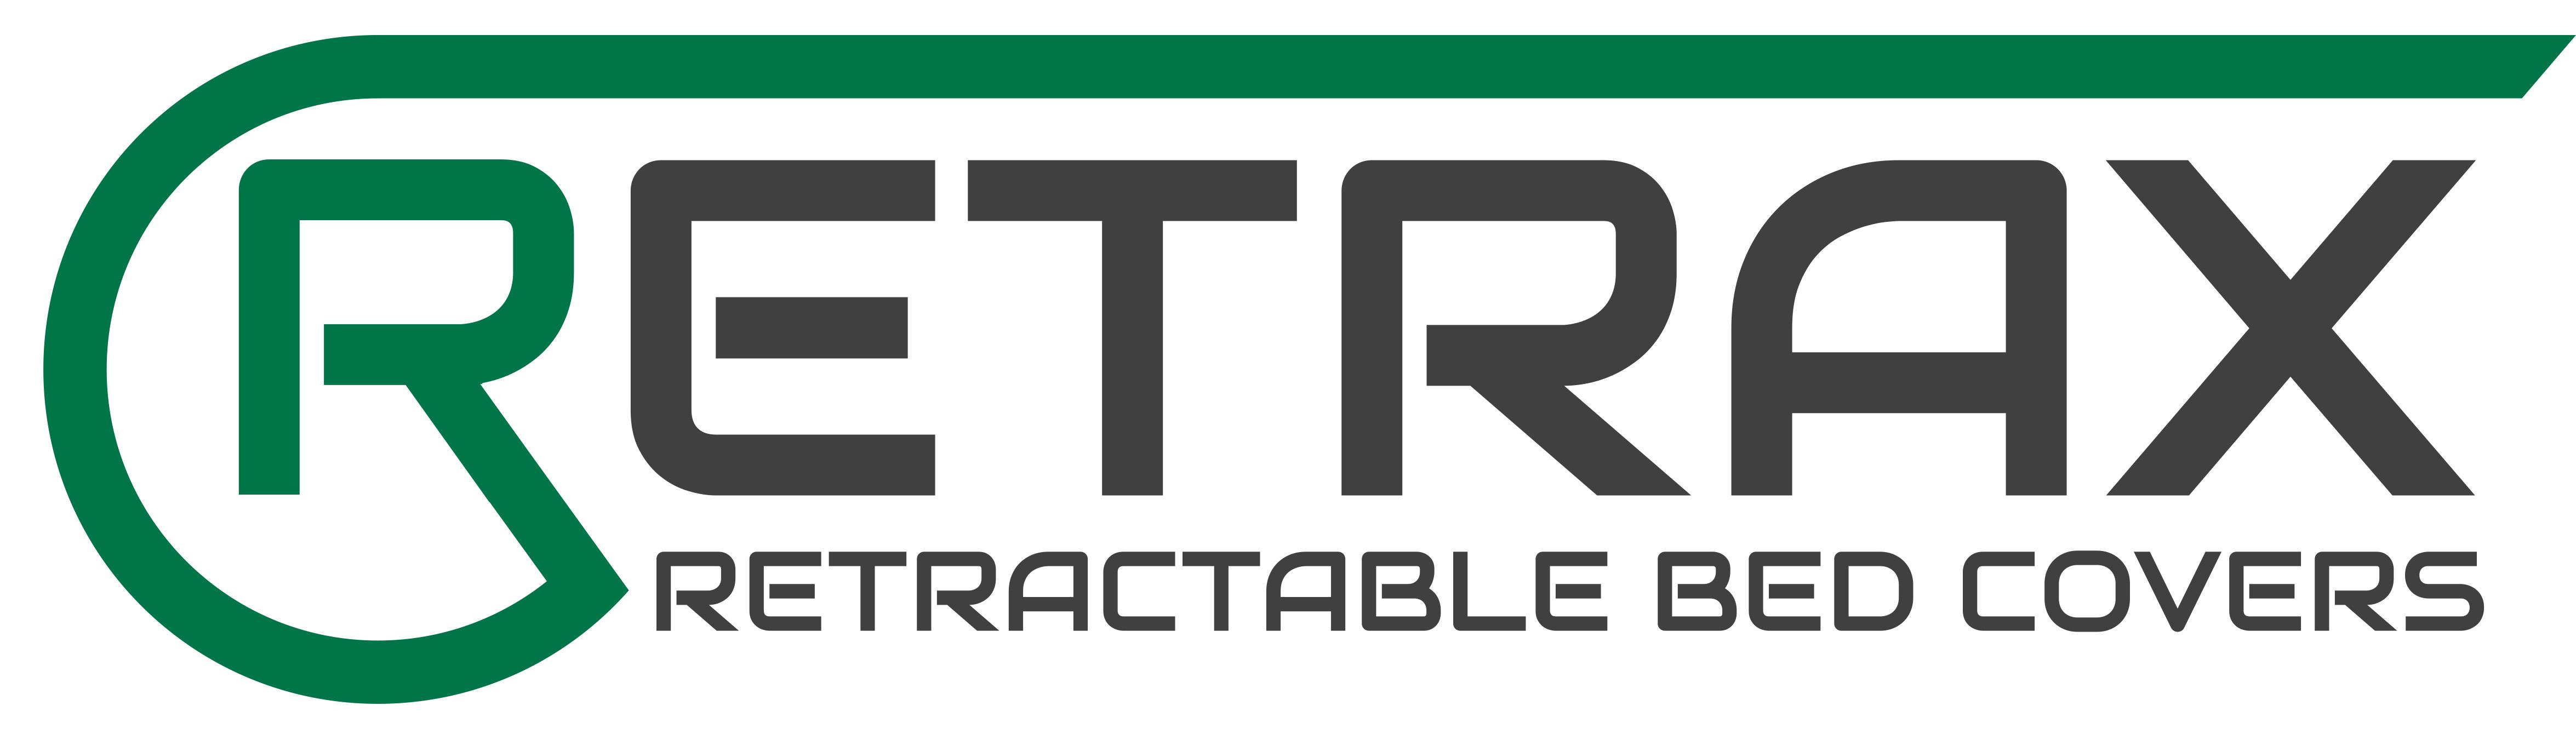 retrax-cover-logo.jpg